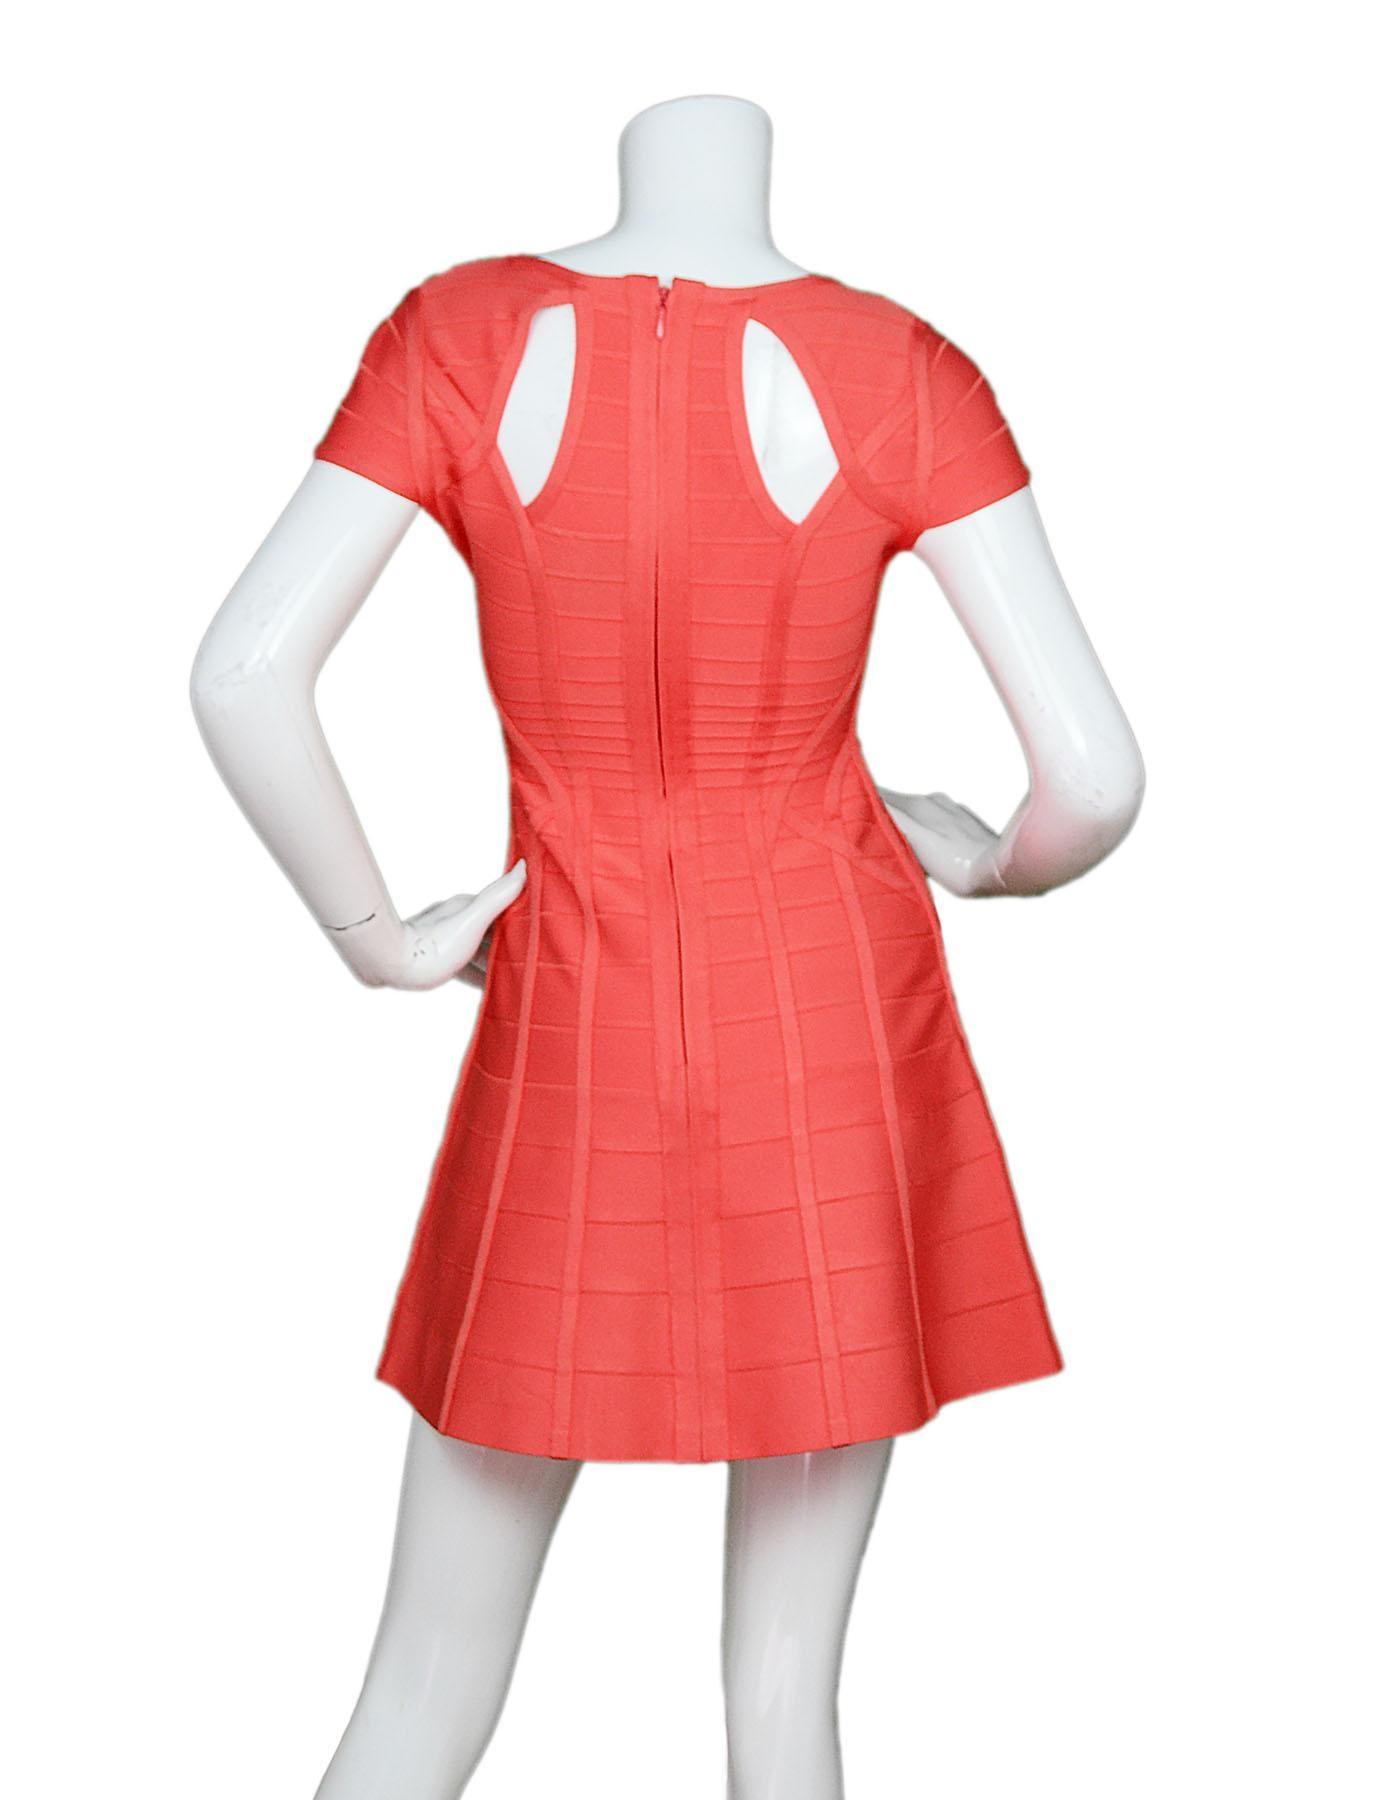 75d066971593 Herve Leger Sunburst Simona Bandage Flare Dress Sz XS For Sale at 1stdibs